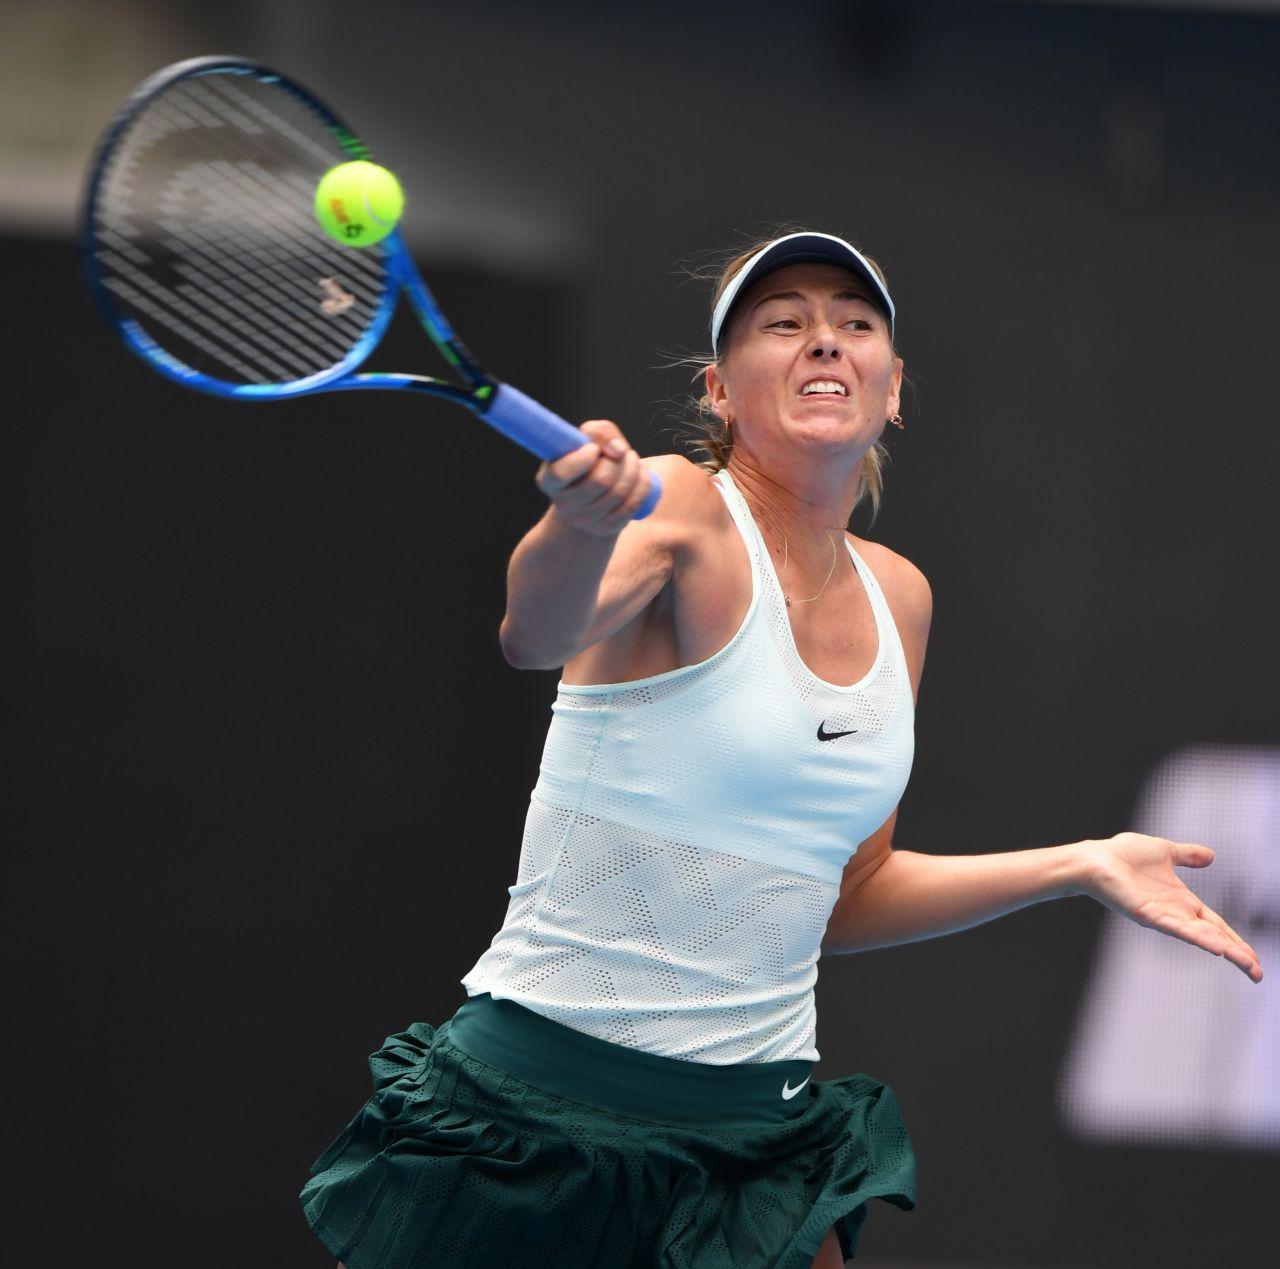 Removed (has Maria sharapova tennis join. agree